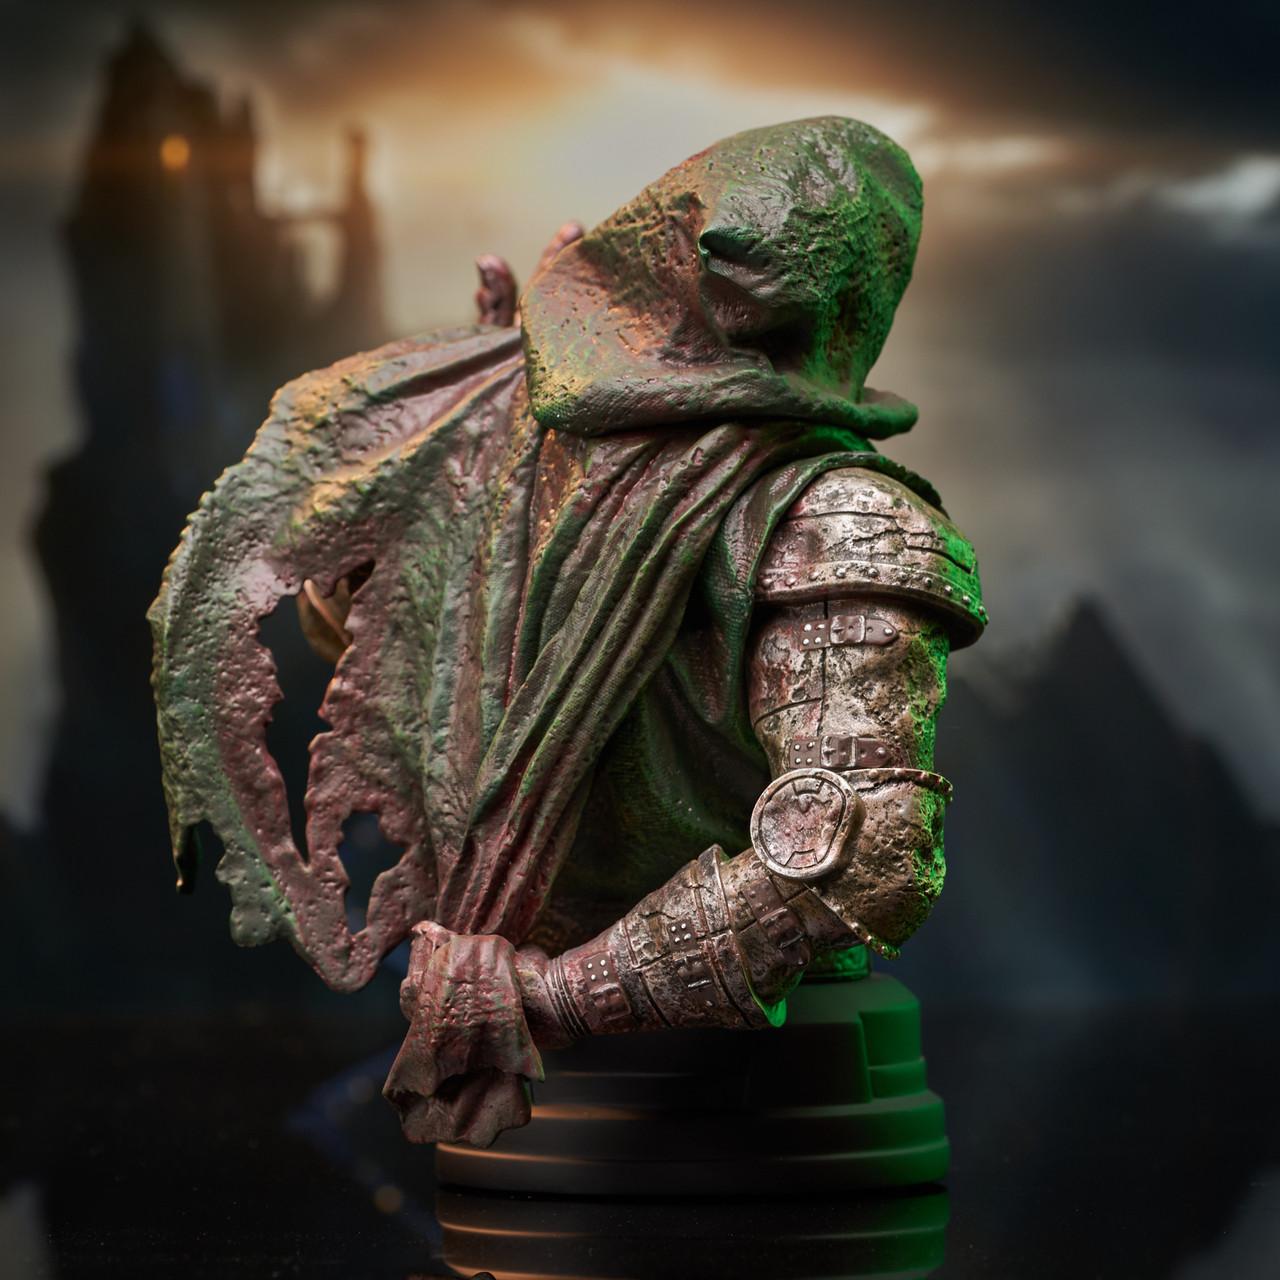 Doctor Doom (Zombie) Mini Bust - 2021 NYCC Exclusive Marvel_ZombieDoom_Bust_04__23179.1628206893